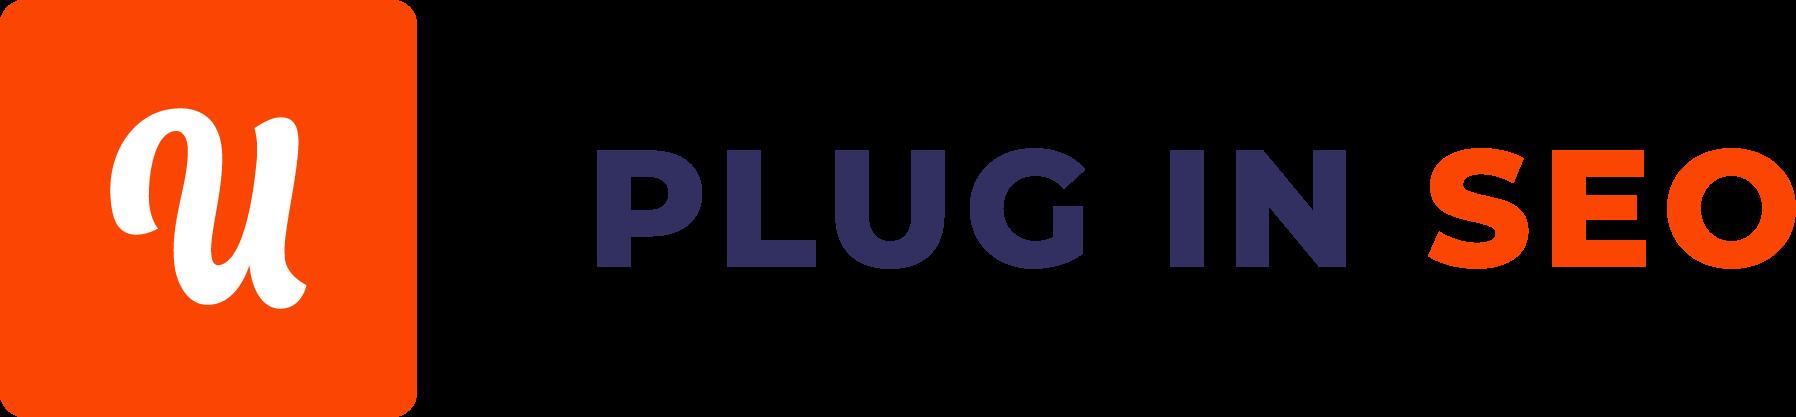 Shopify SEO App - Plug In SEO